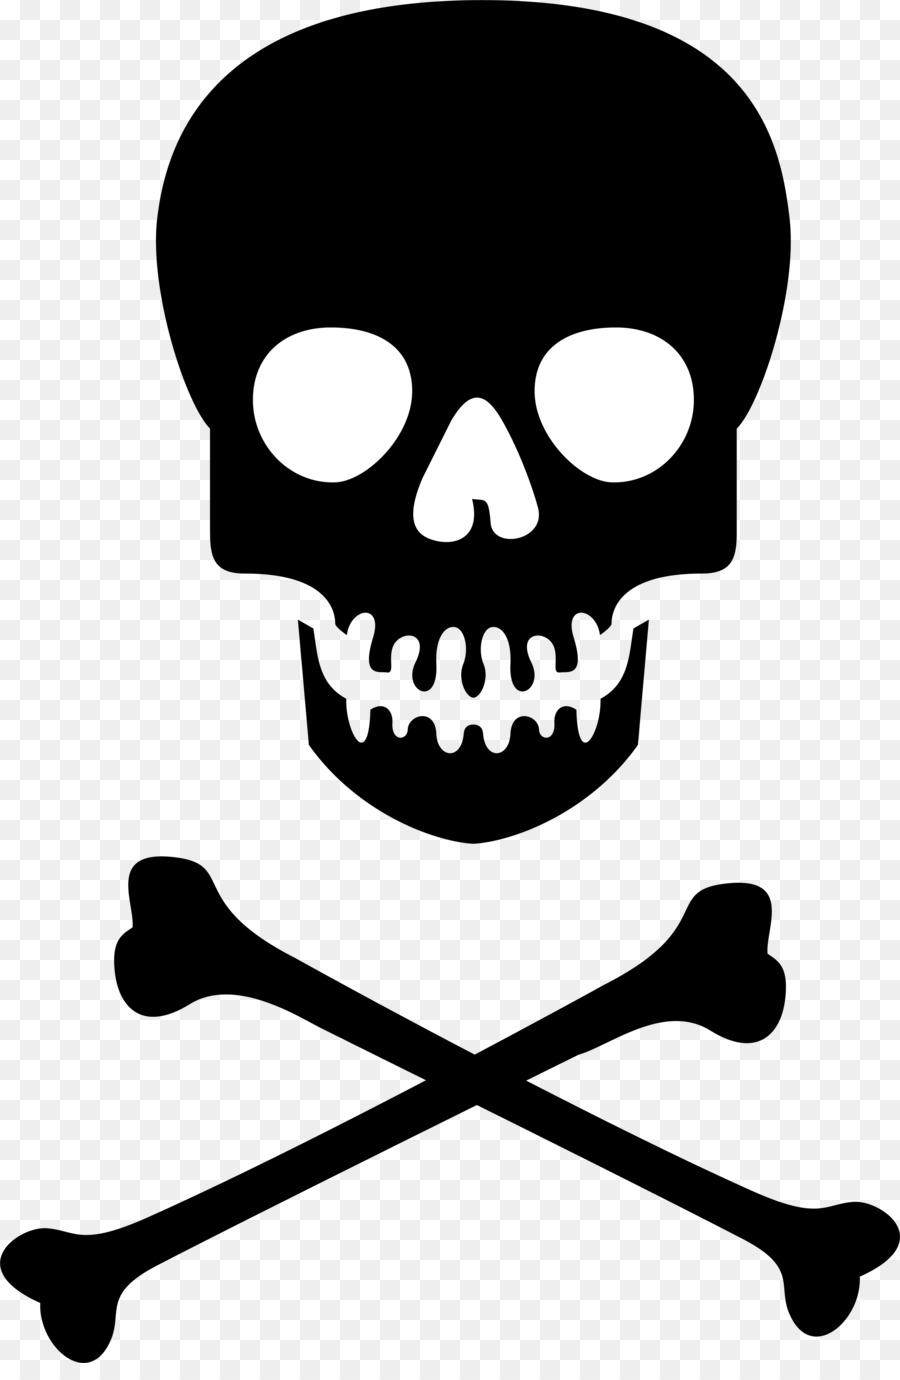 Skull And Crossbones Clip Art Free : skull, crossbones, Hazard, Symbol, Skull, Crossbones, Poison, Clipart, Download, 2400*3635, Transparent, Download., Library